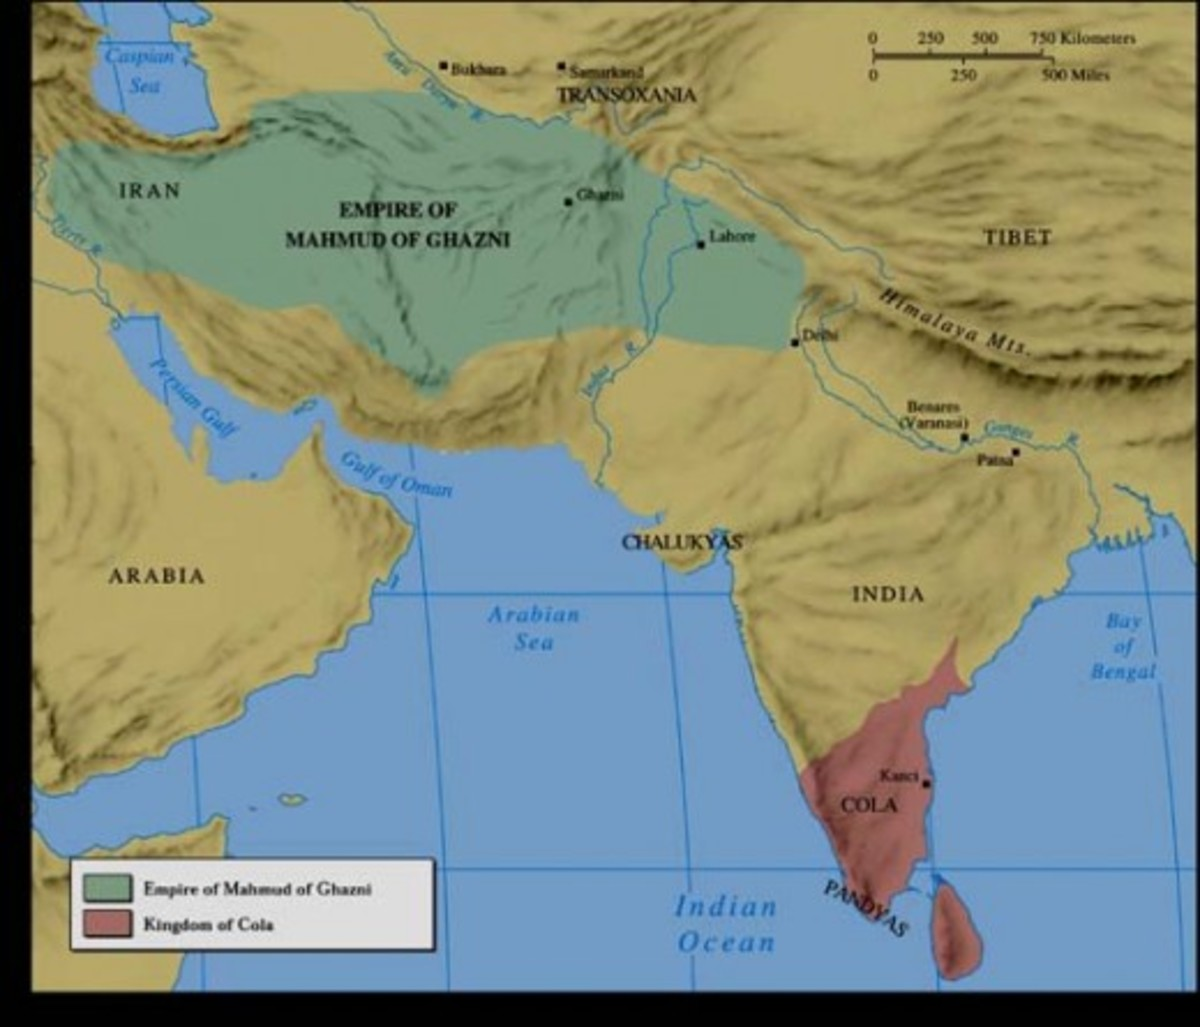 The Ghazni empire